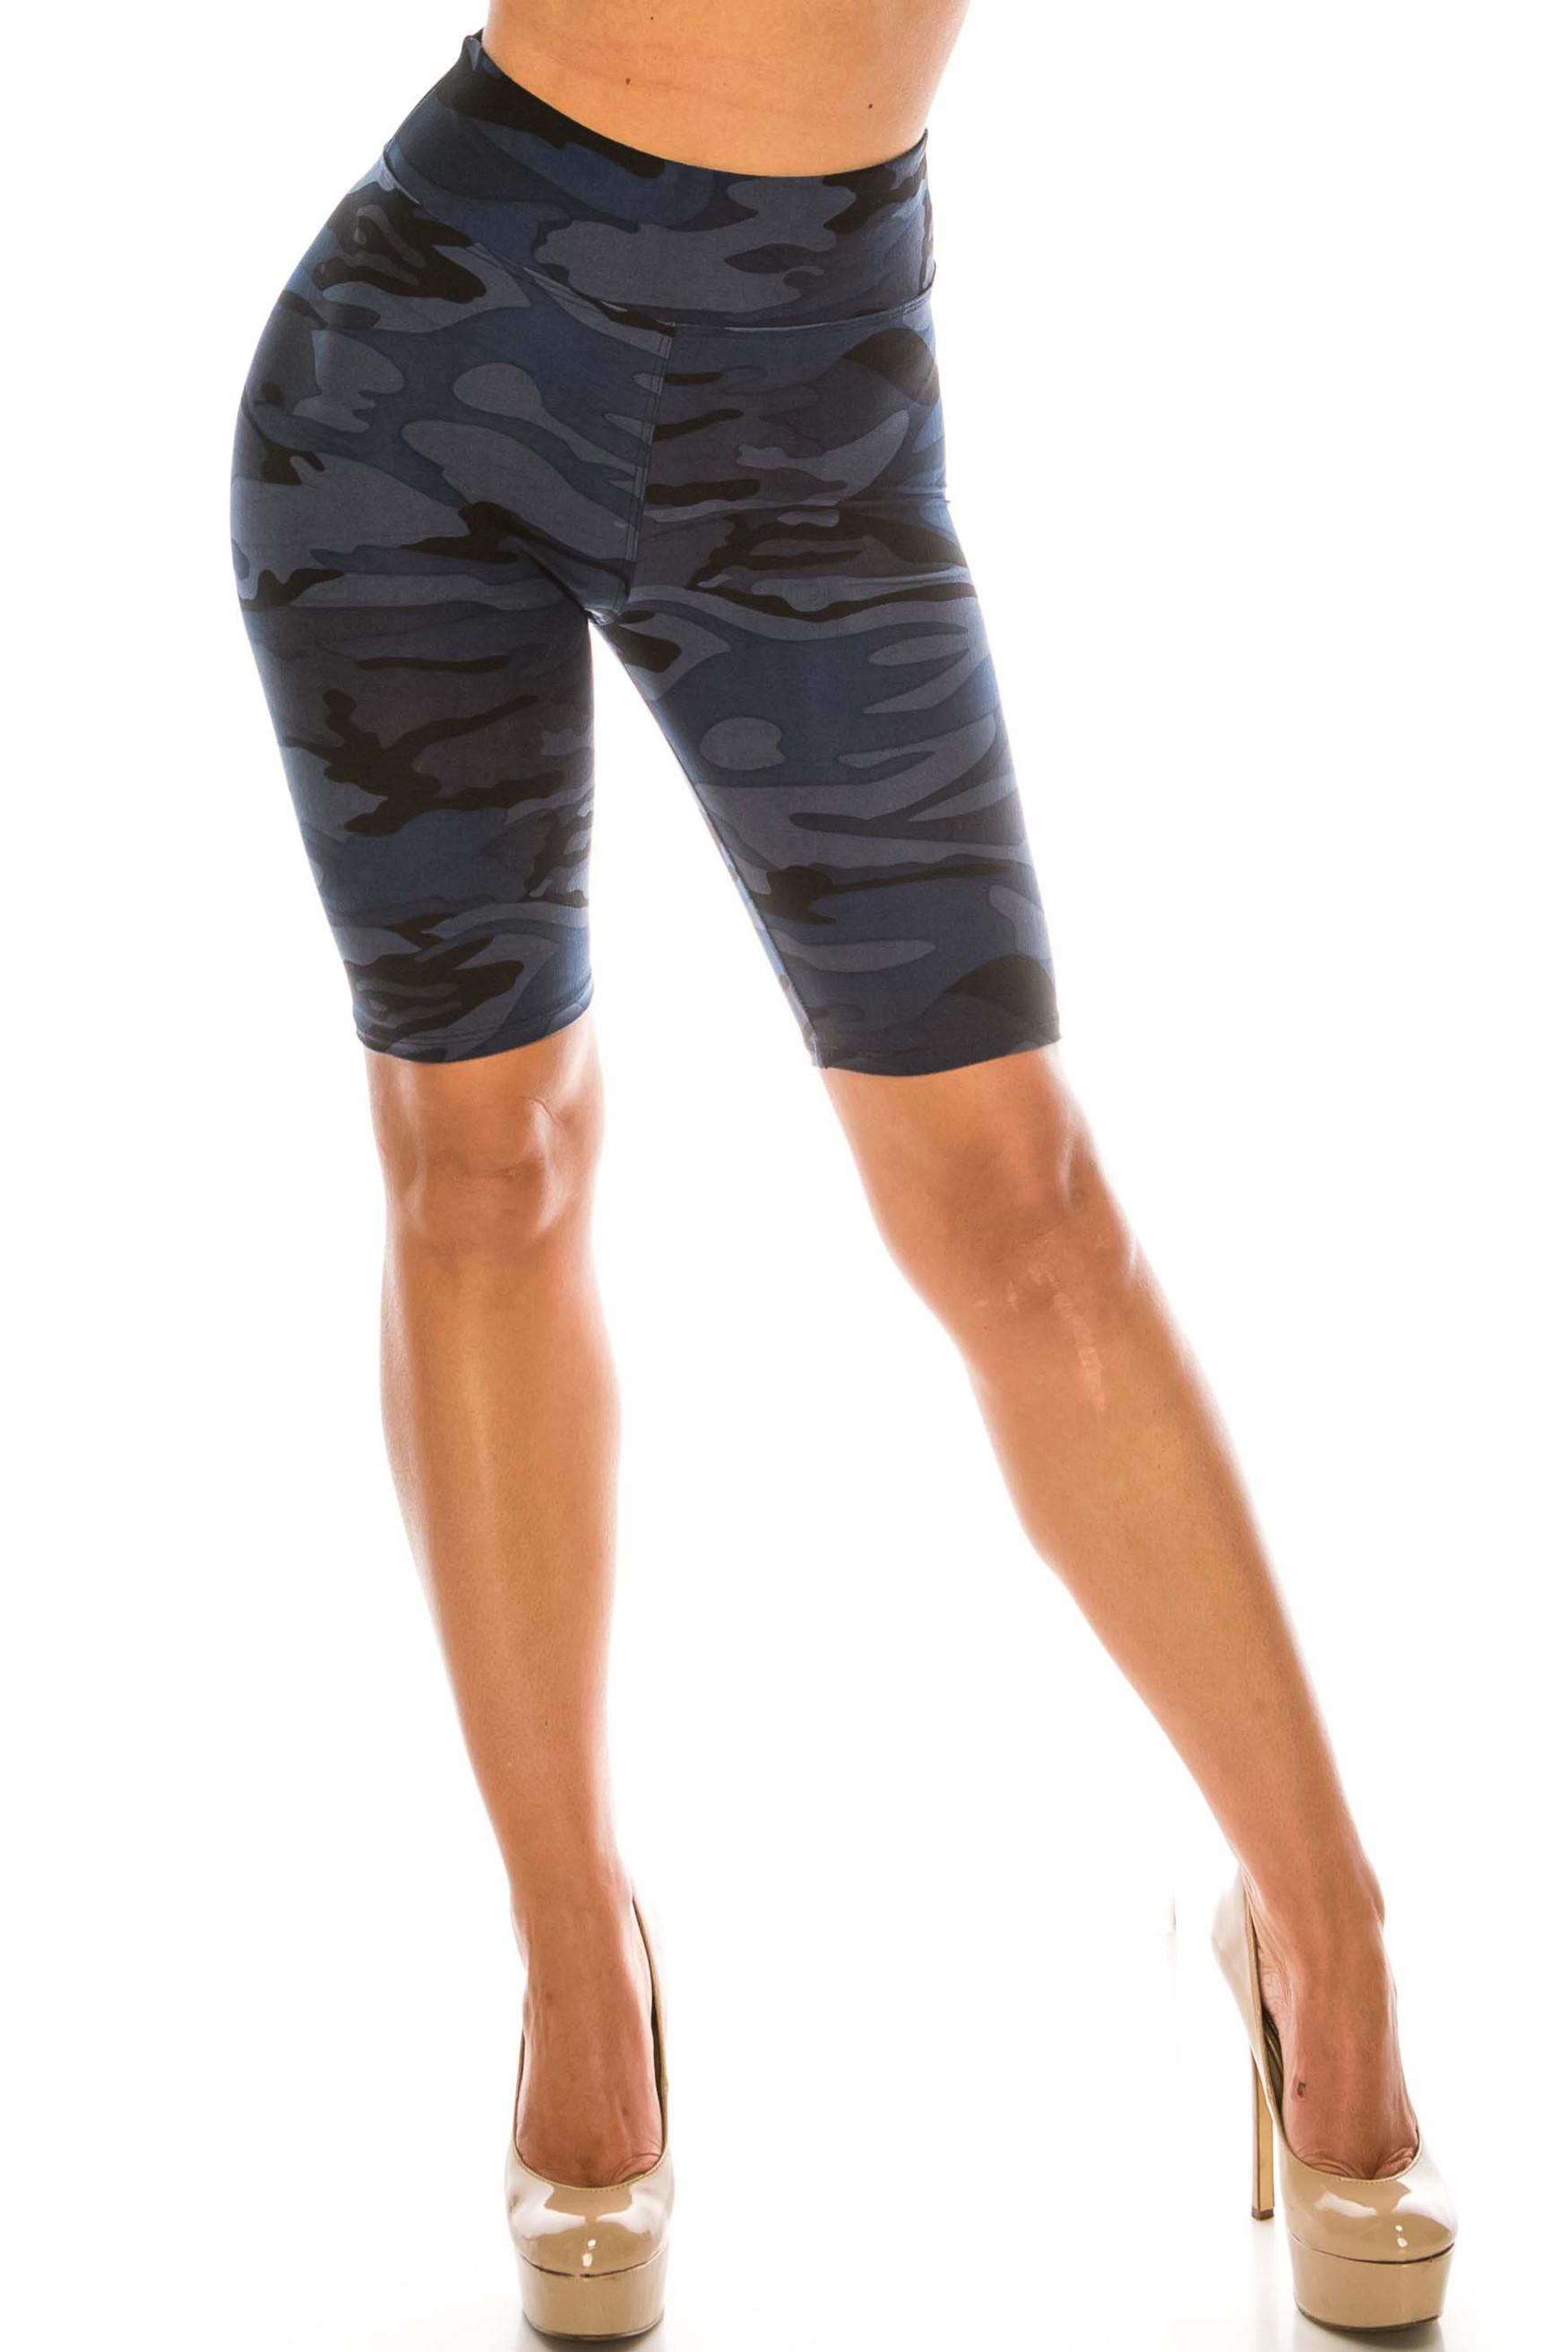 Buttery Soft  Navy Camouflage Biker Shorts - 3 Inch Waist